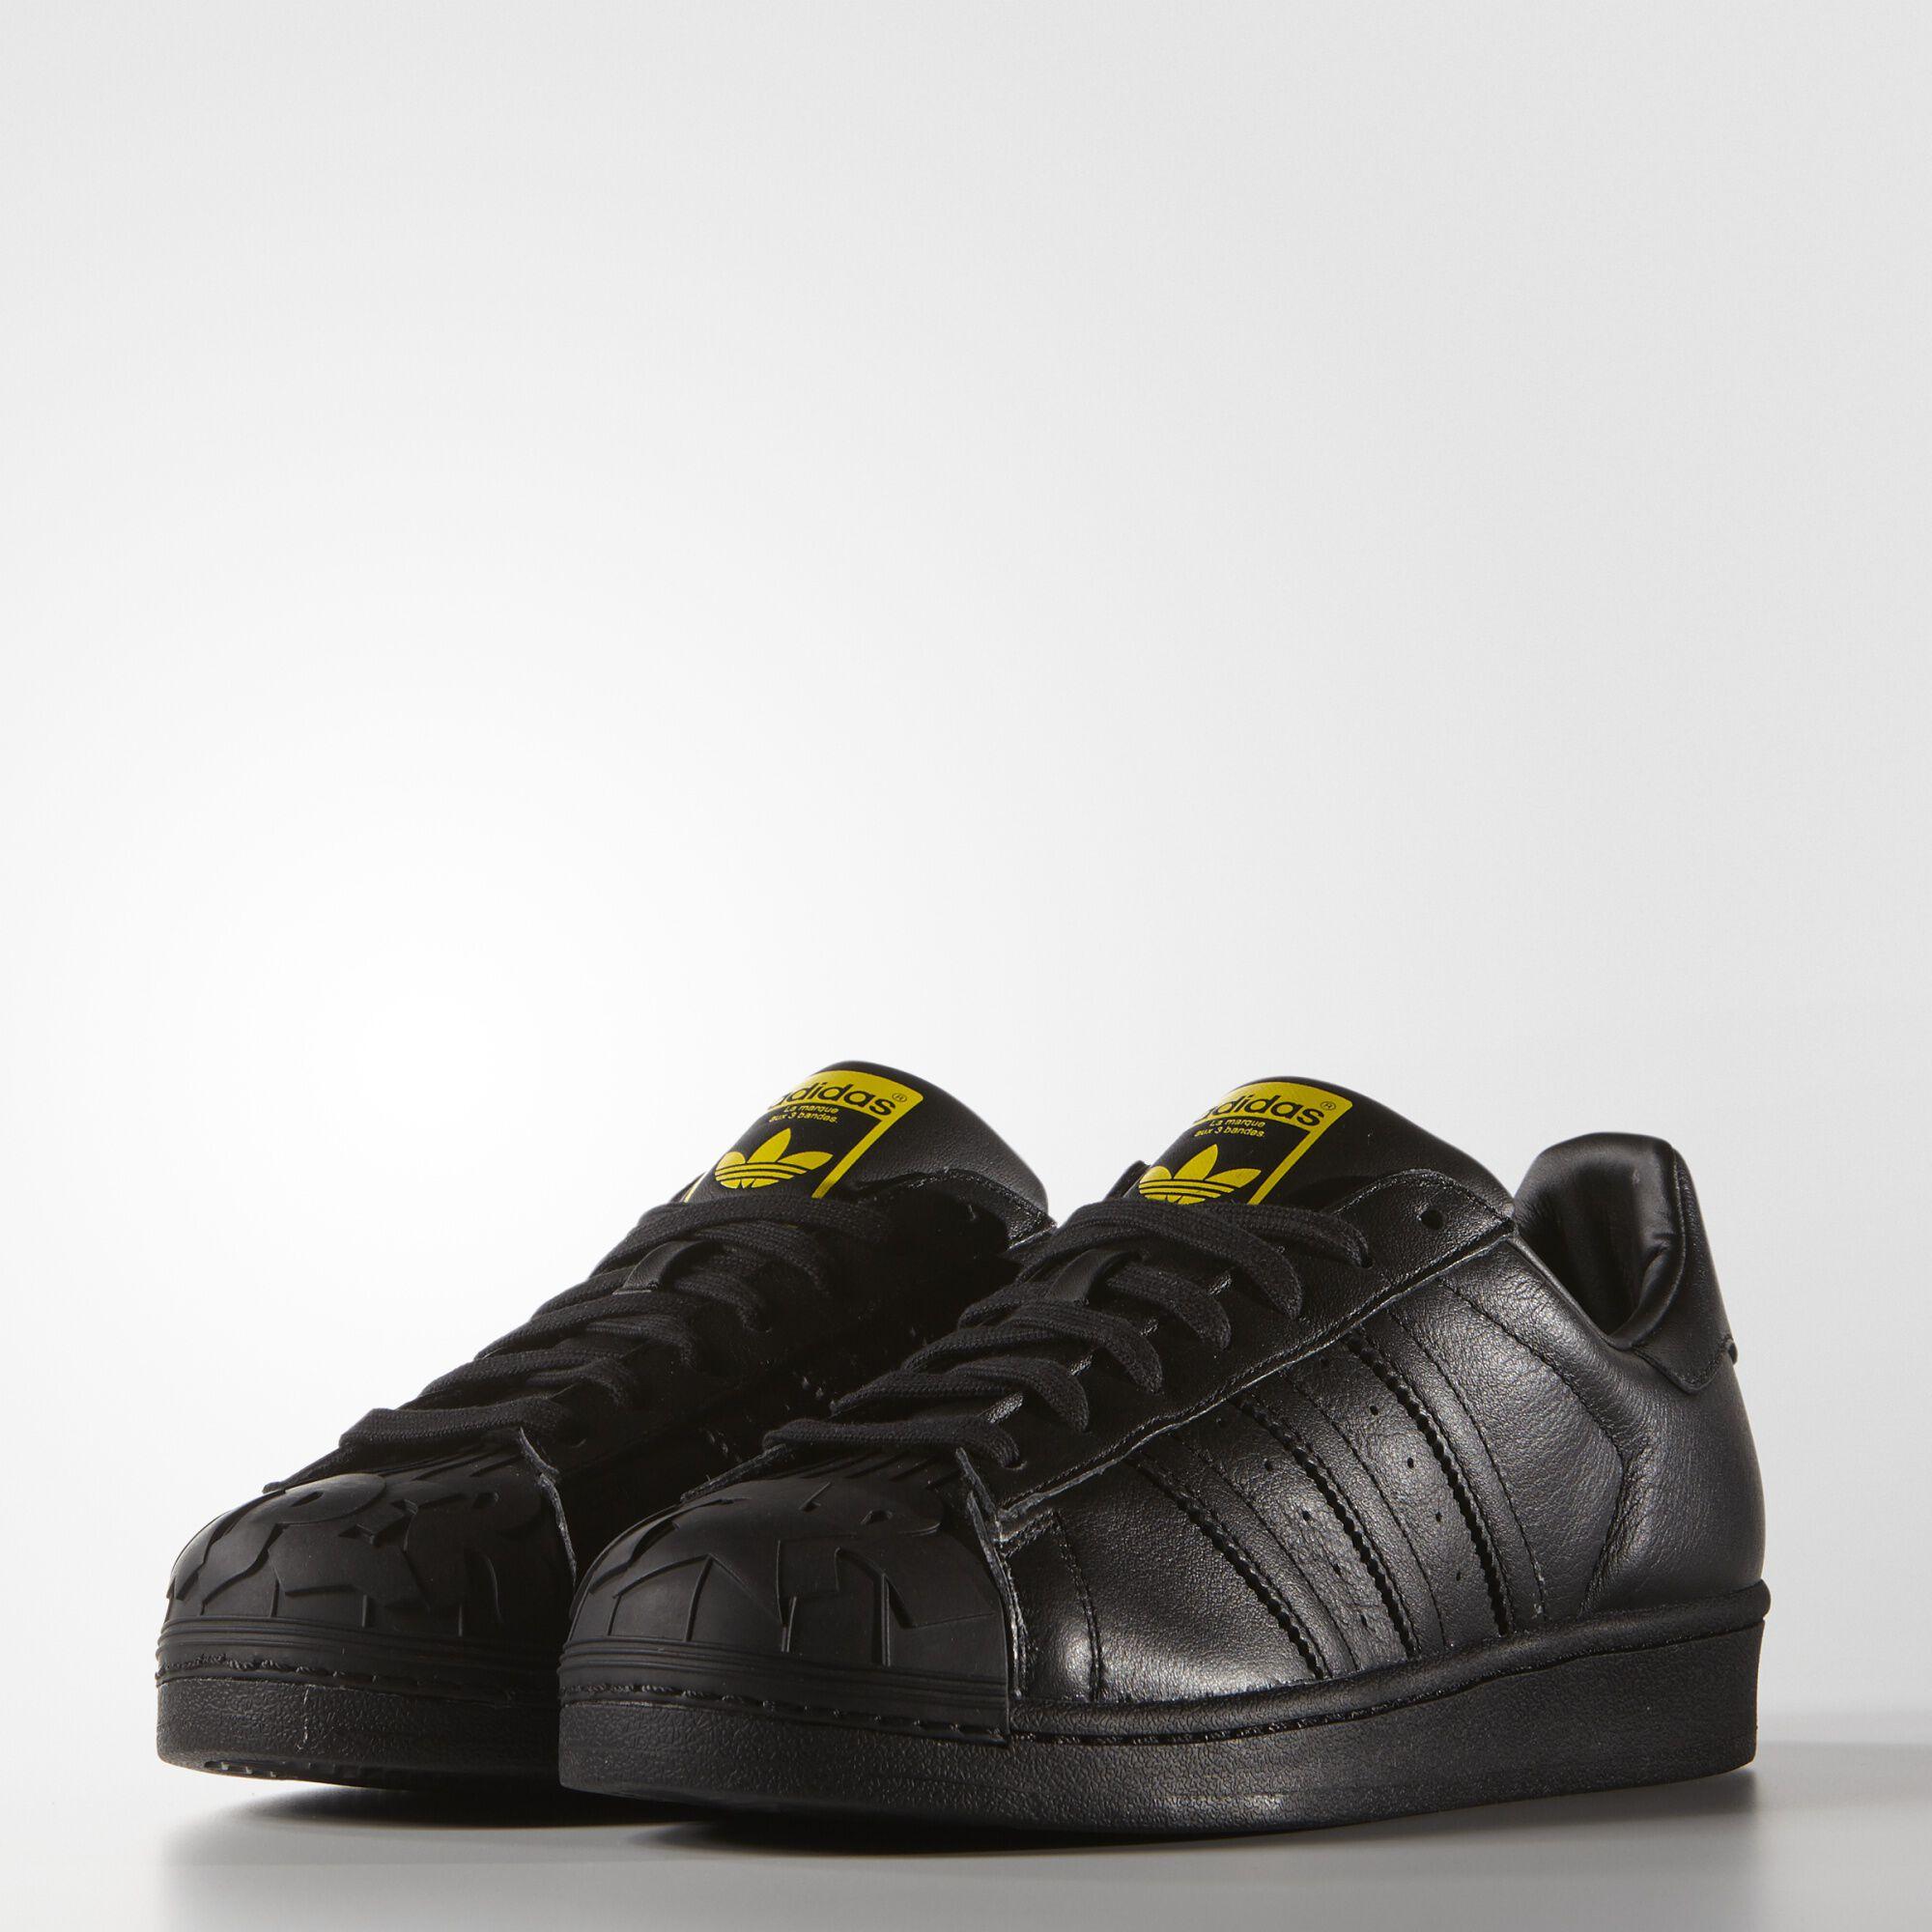 the latest a6996 890d8 Zapatos Para Correr Adidas Originals Yeezy Boost 350 Hombre Todos Rojas M谩s  barato,ropa adidas barata chile,chaquetas adidas baratas,outlet madrid